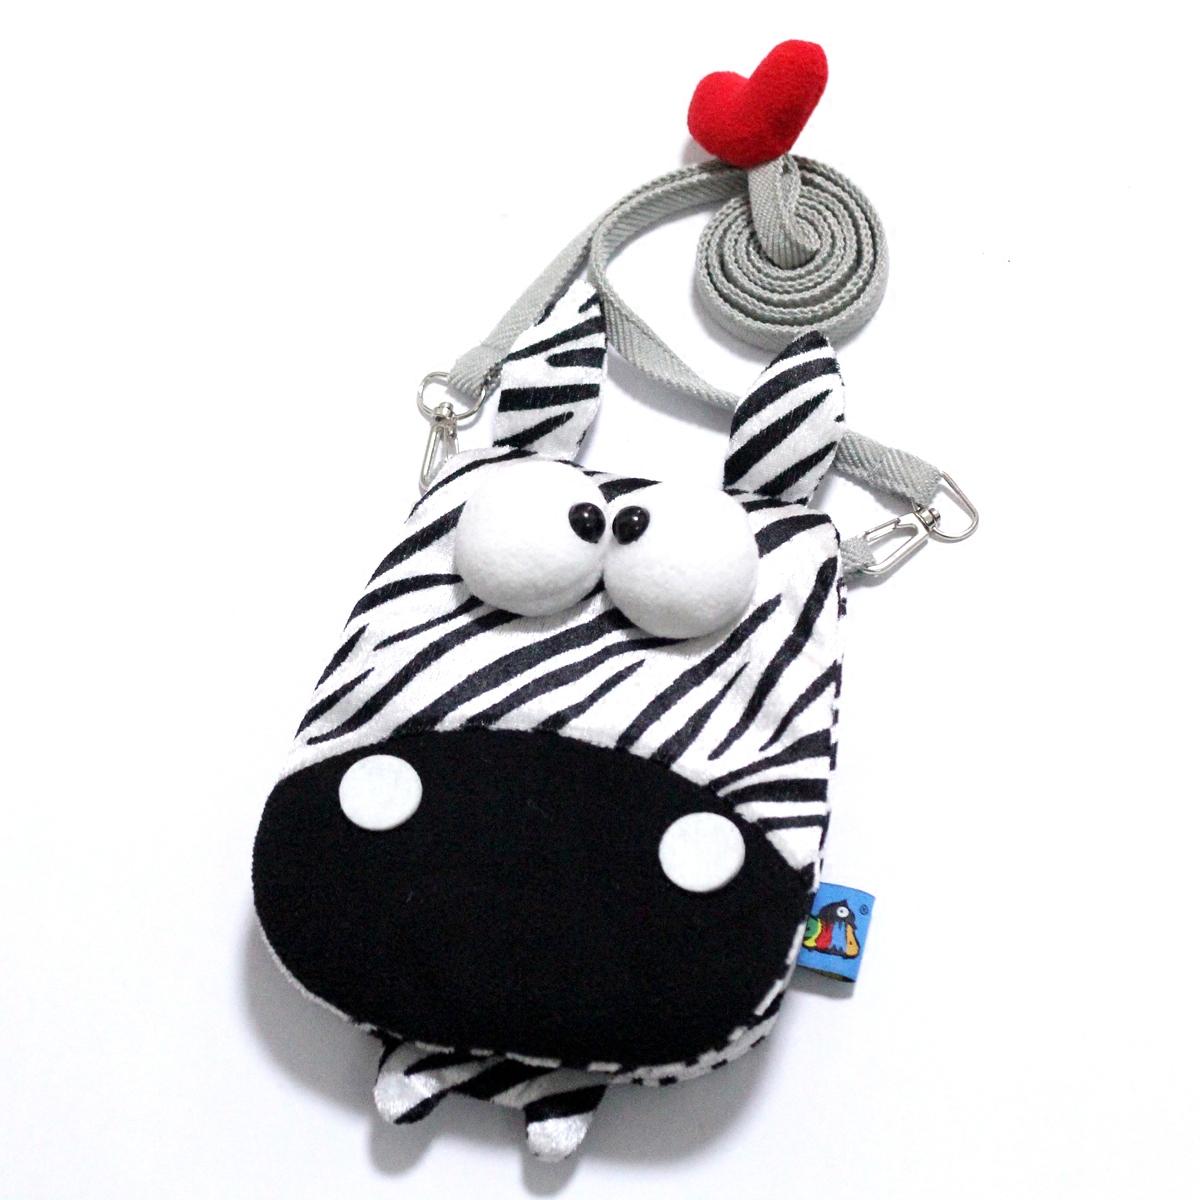 PLUMO三星苹果iPhone6plus斜跨零钱手机包保护毛绒萌可爱卡通斑马